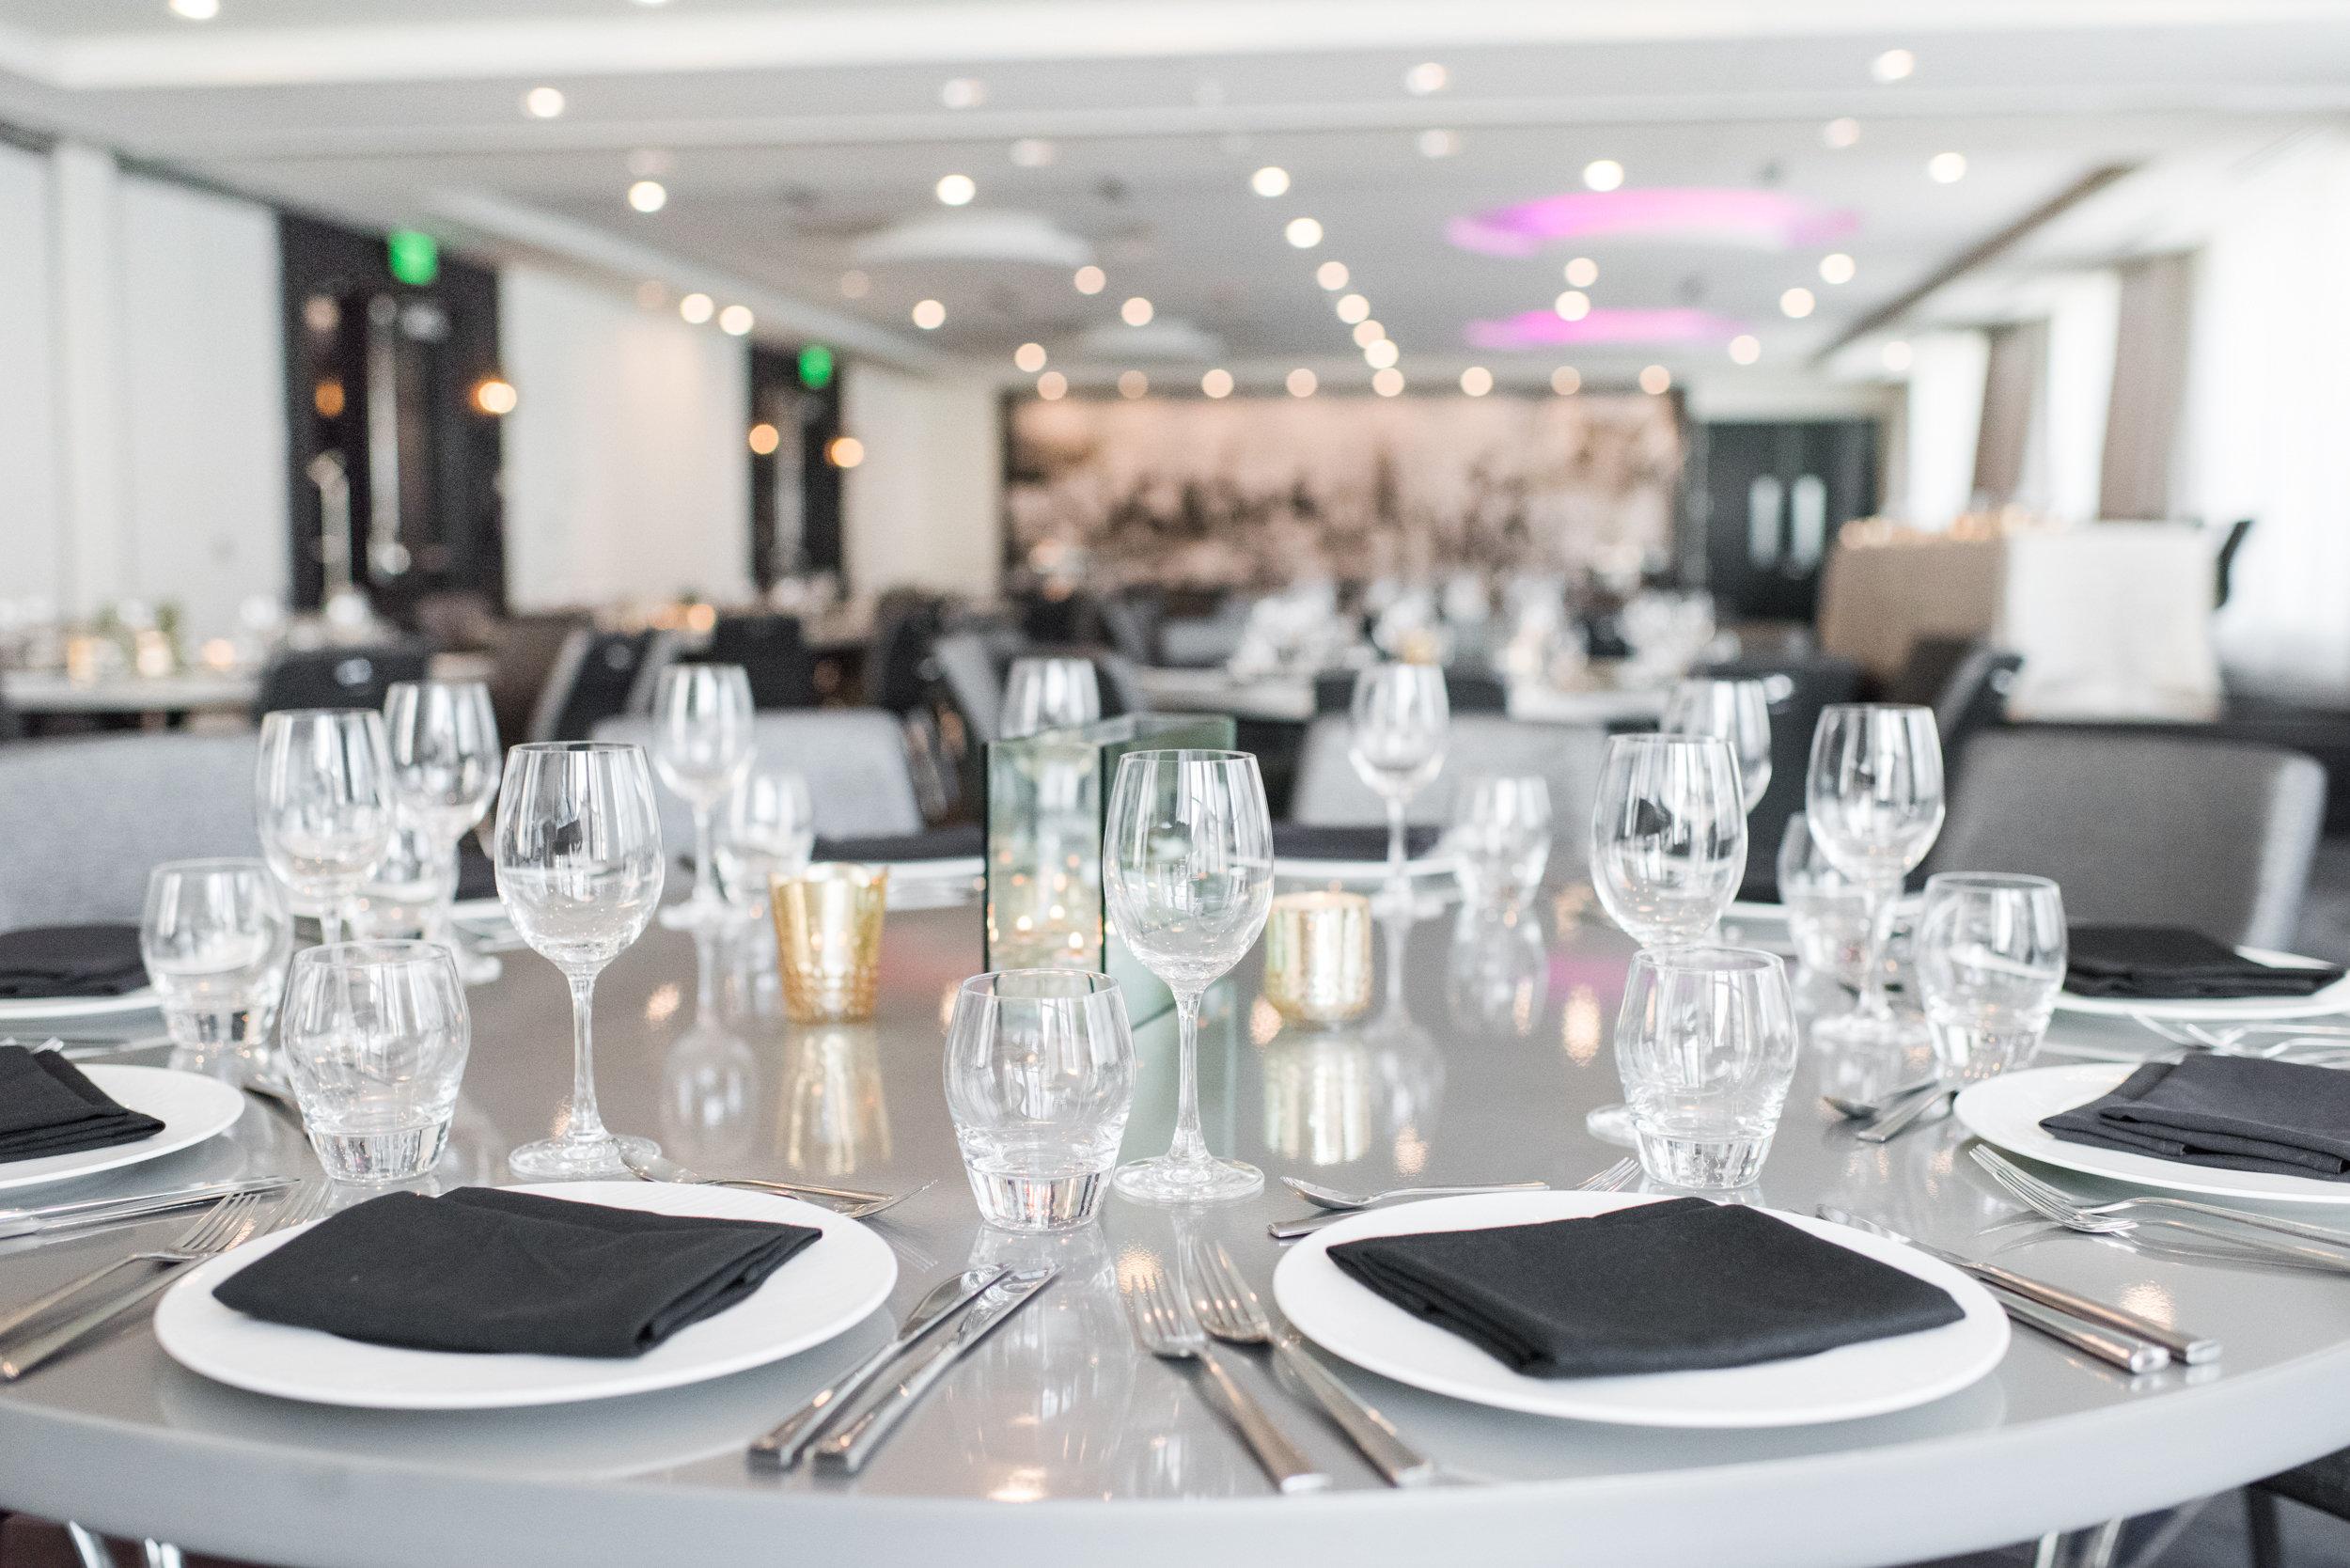 Branding Event Design, Corporate Event Planning, Corporate Event Design, Jessica Wonders Events